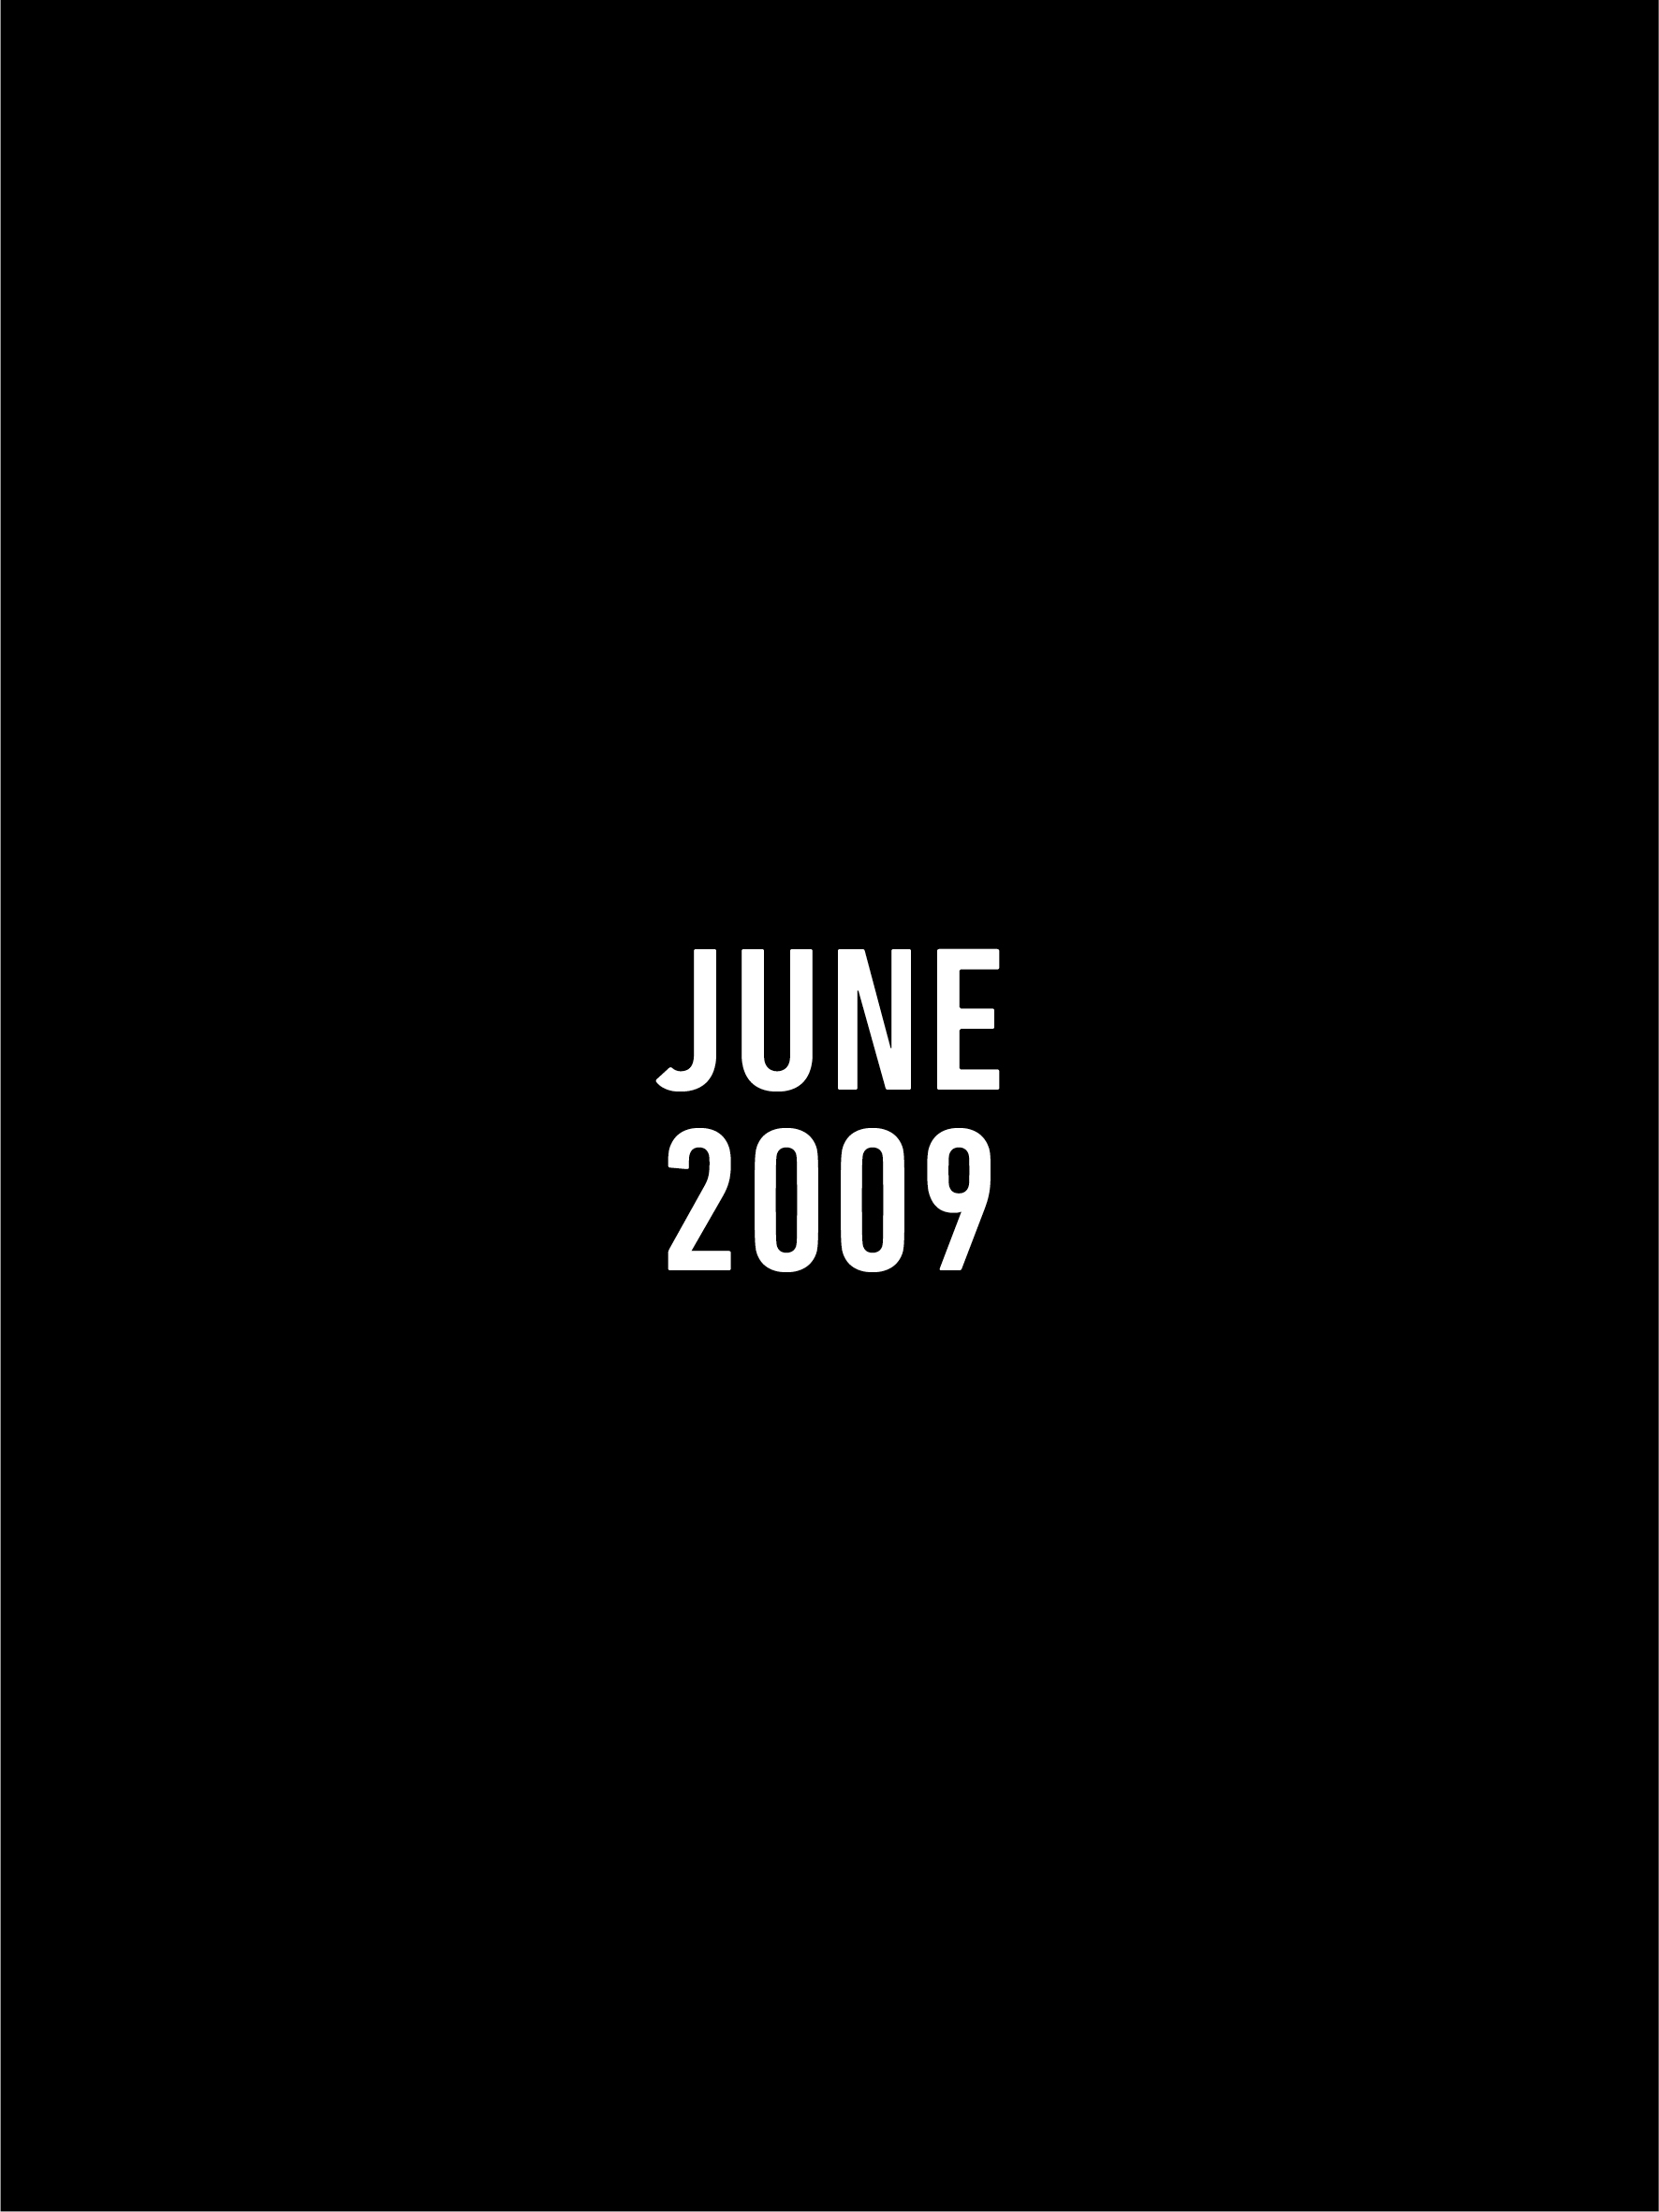 2009 monthly6.jpg